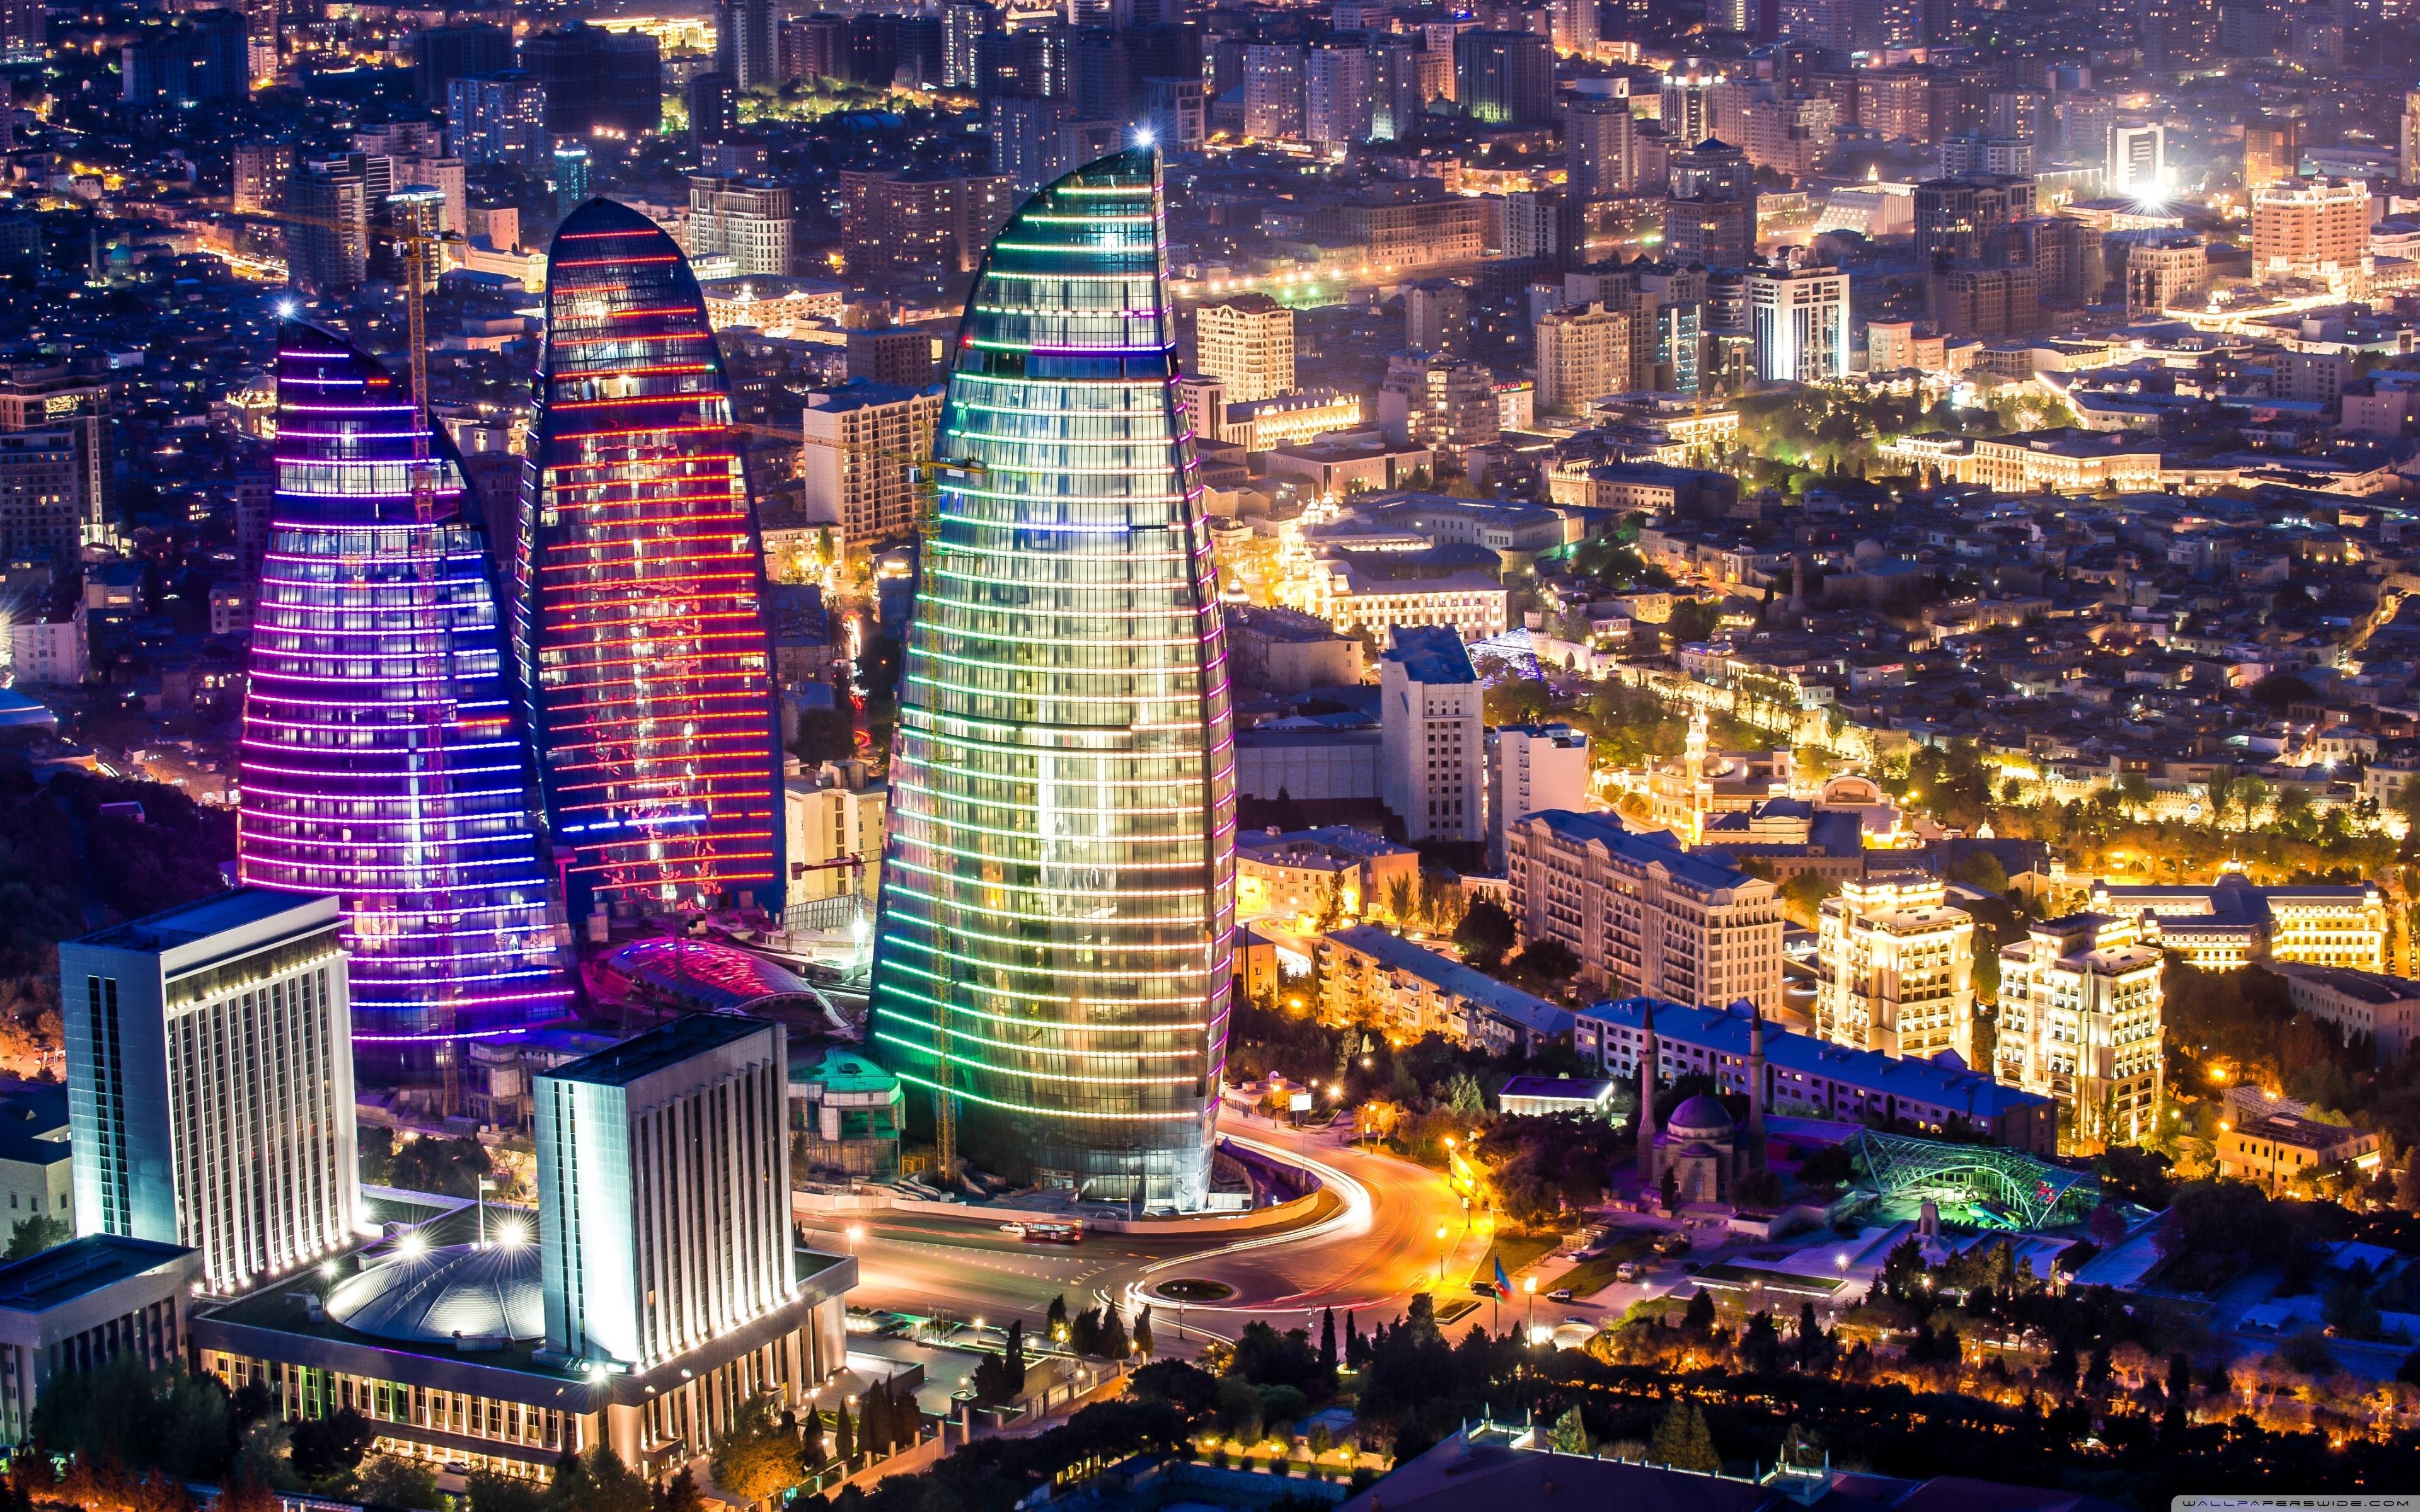 Flame Towers Baku Azerbaijan 4K HD Desktop Wallpaper for 3840x2400